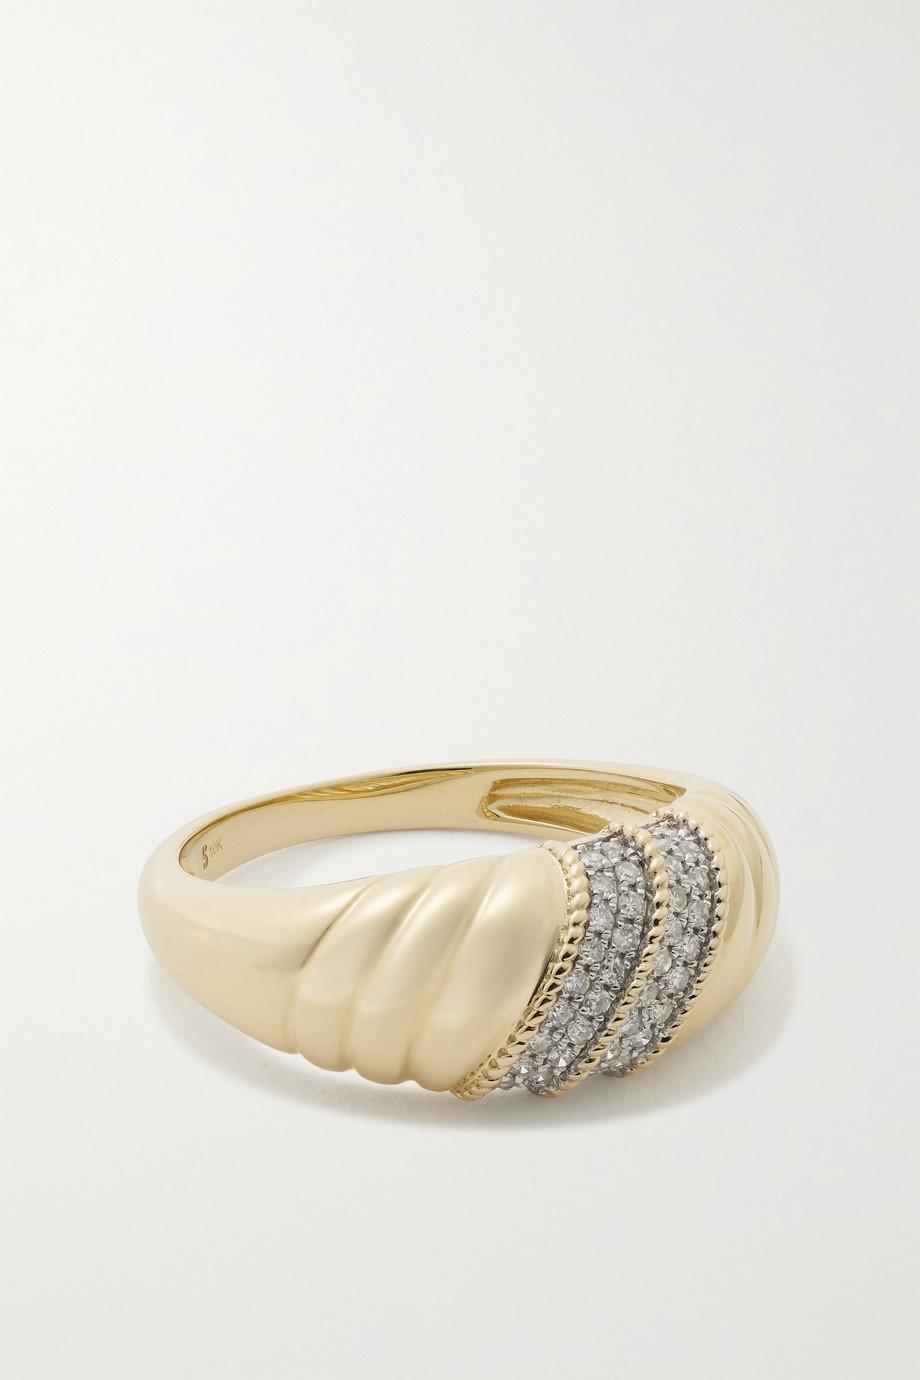 STONE AND STRAND Bague en or 10 carats (416/1000) et diamants Le Grande Cupola